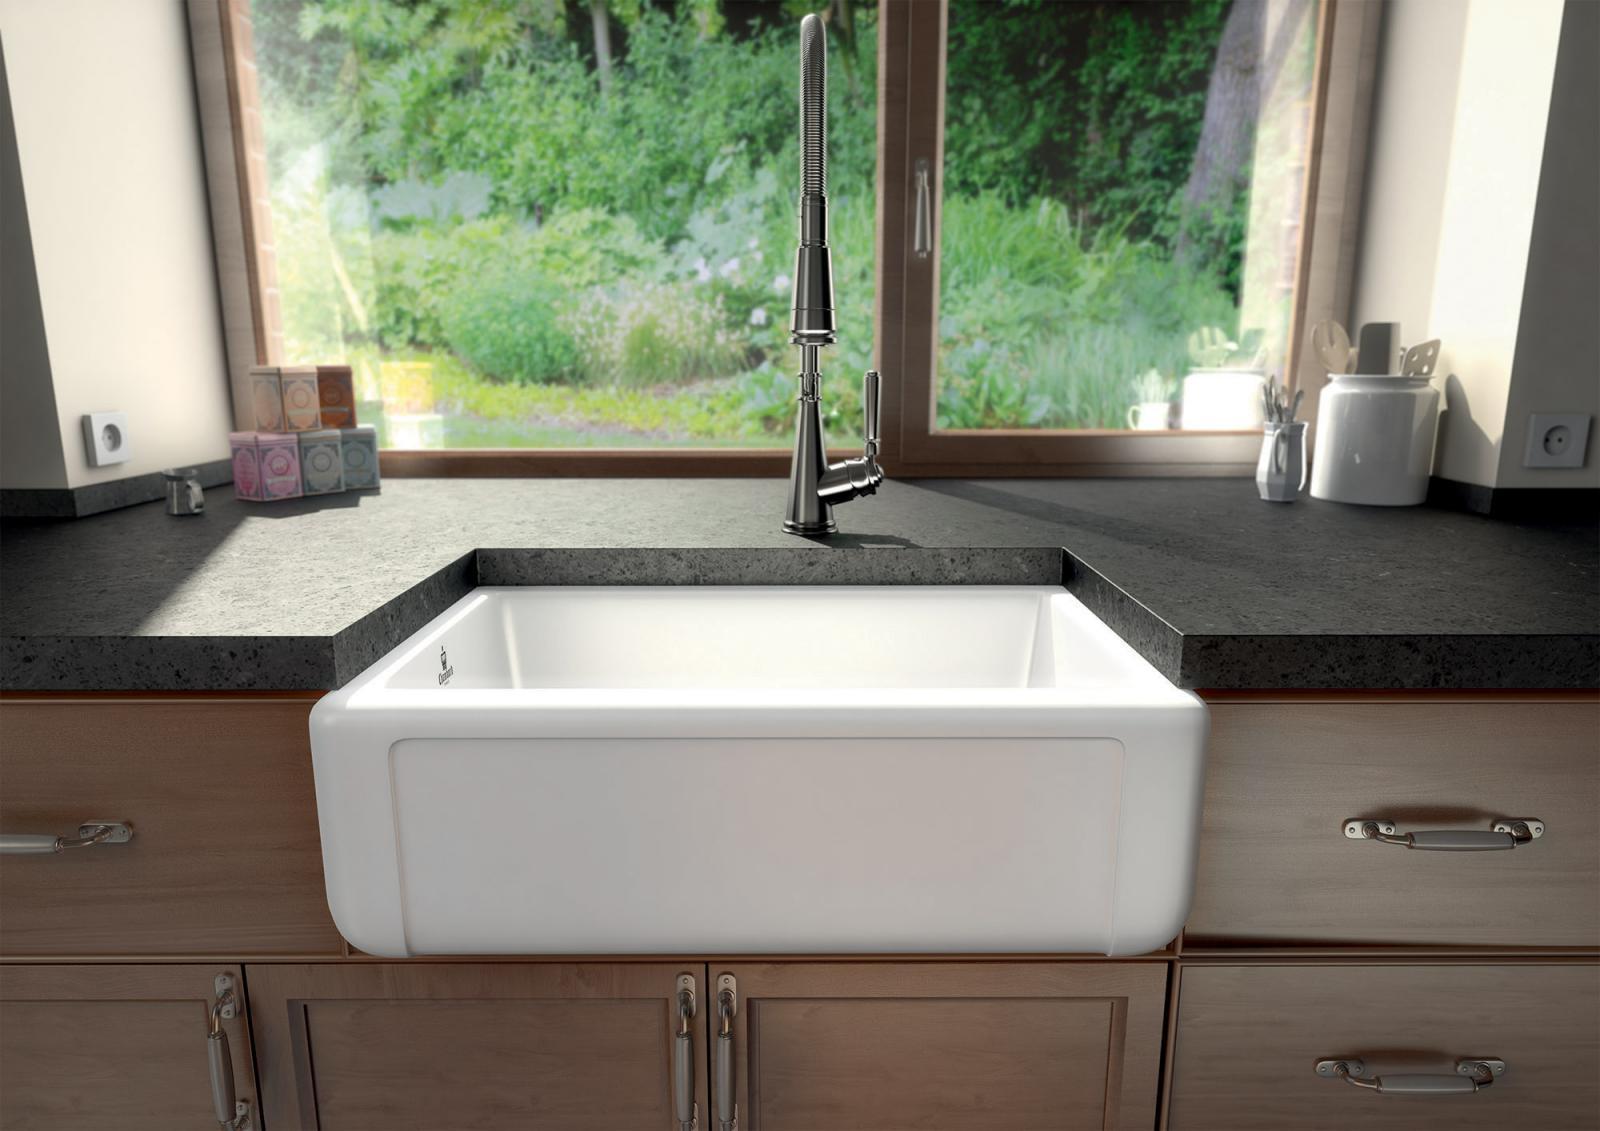 High-quality sink Henri II Le Grand - single bowl, ceramic - 2